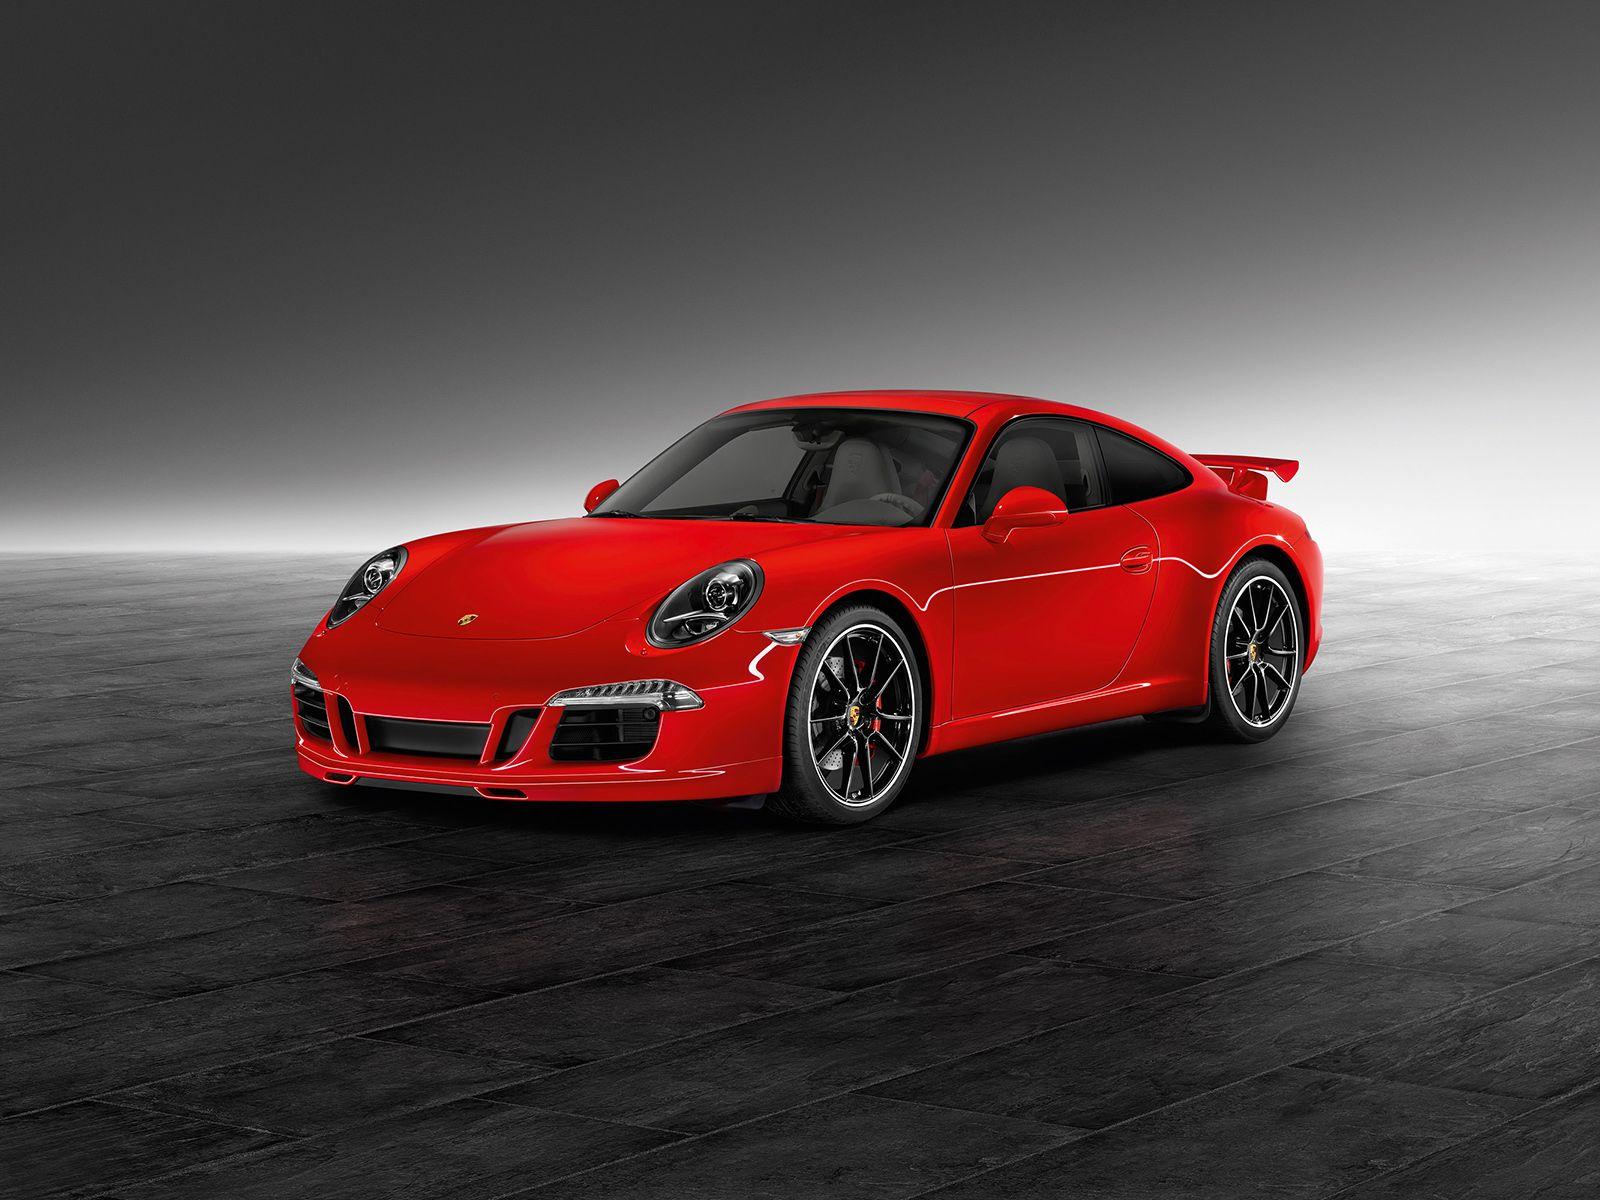 Red 911 Carrera S